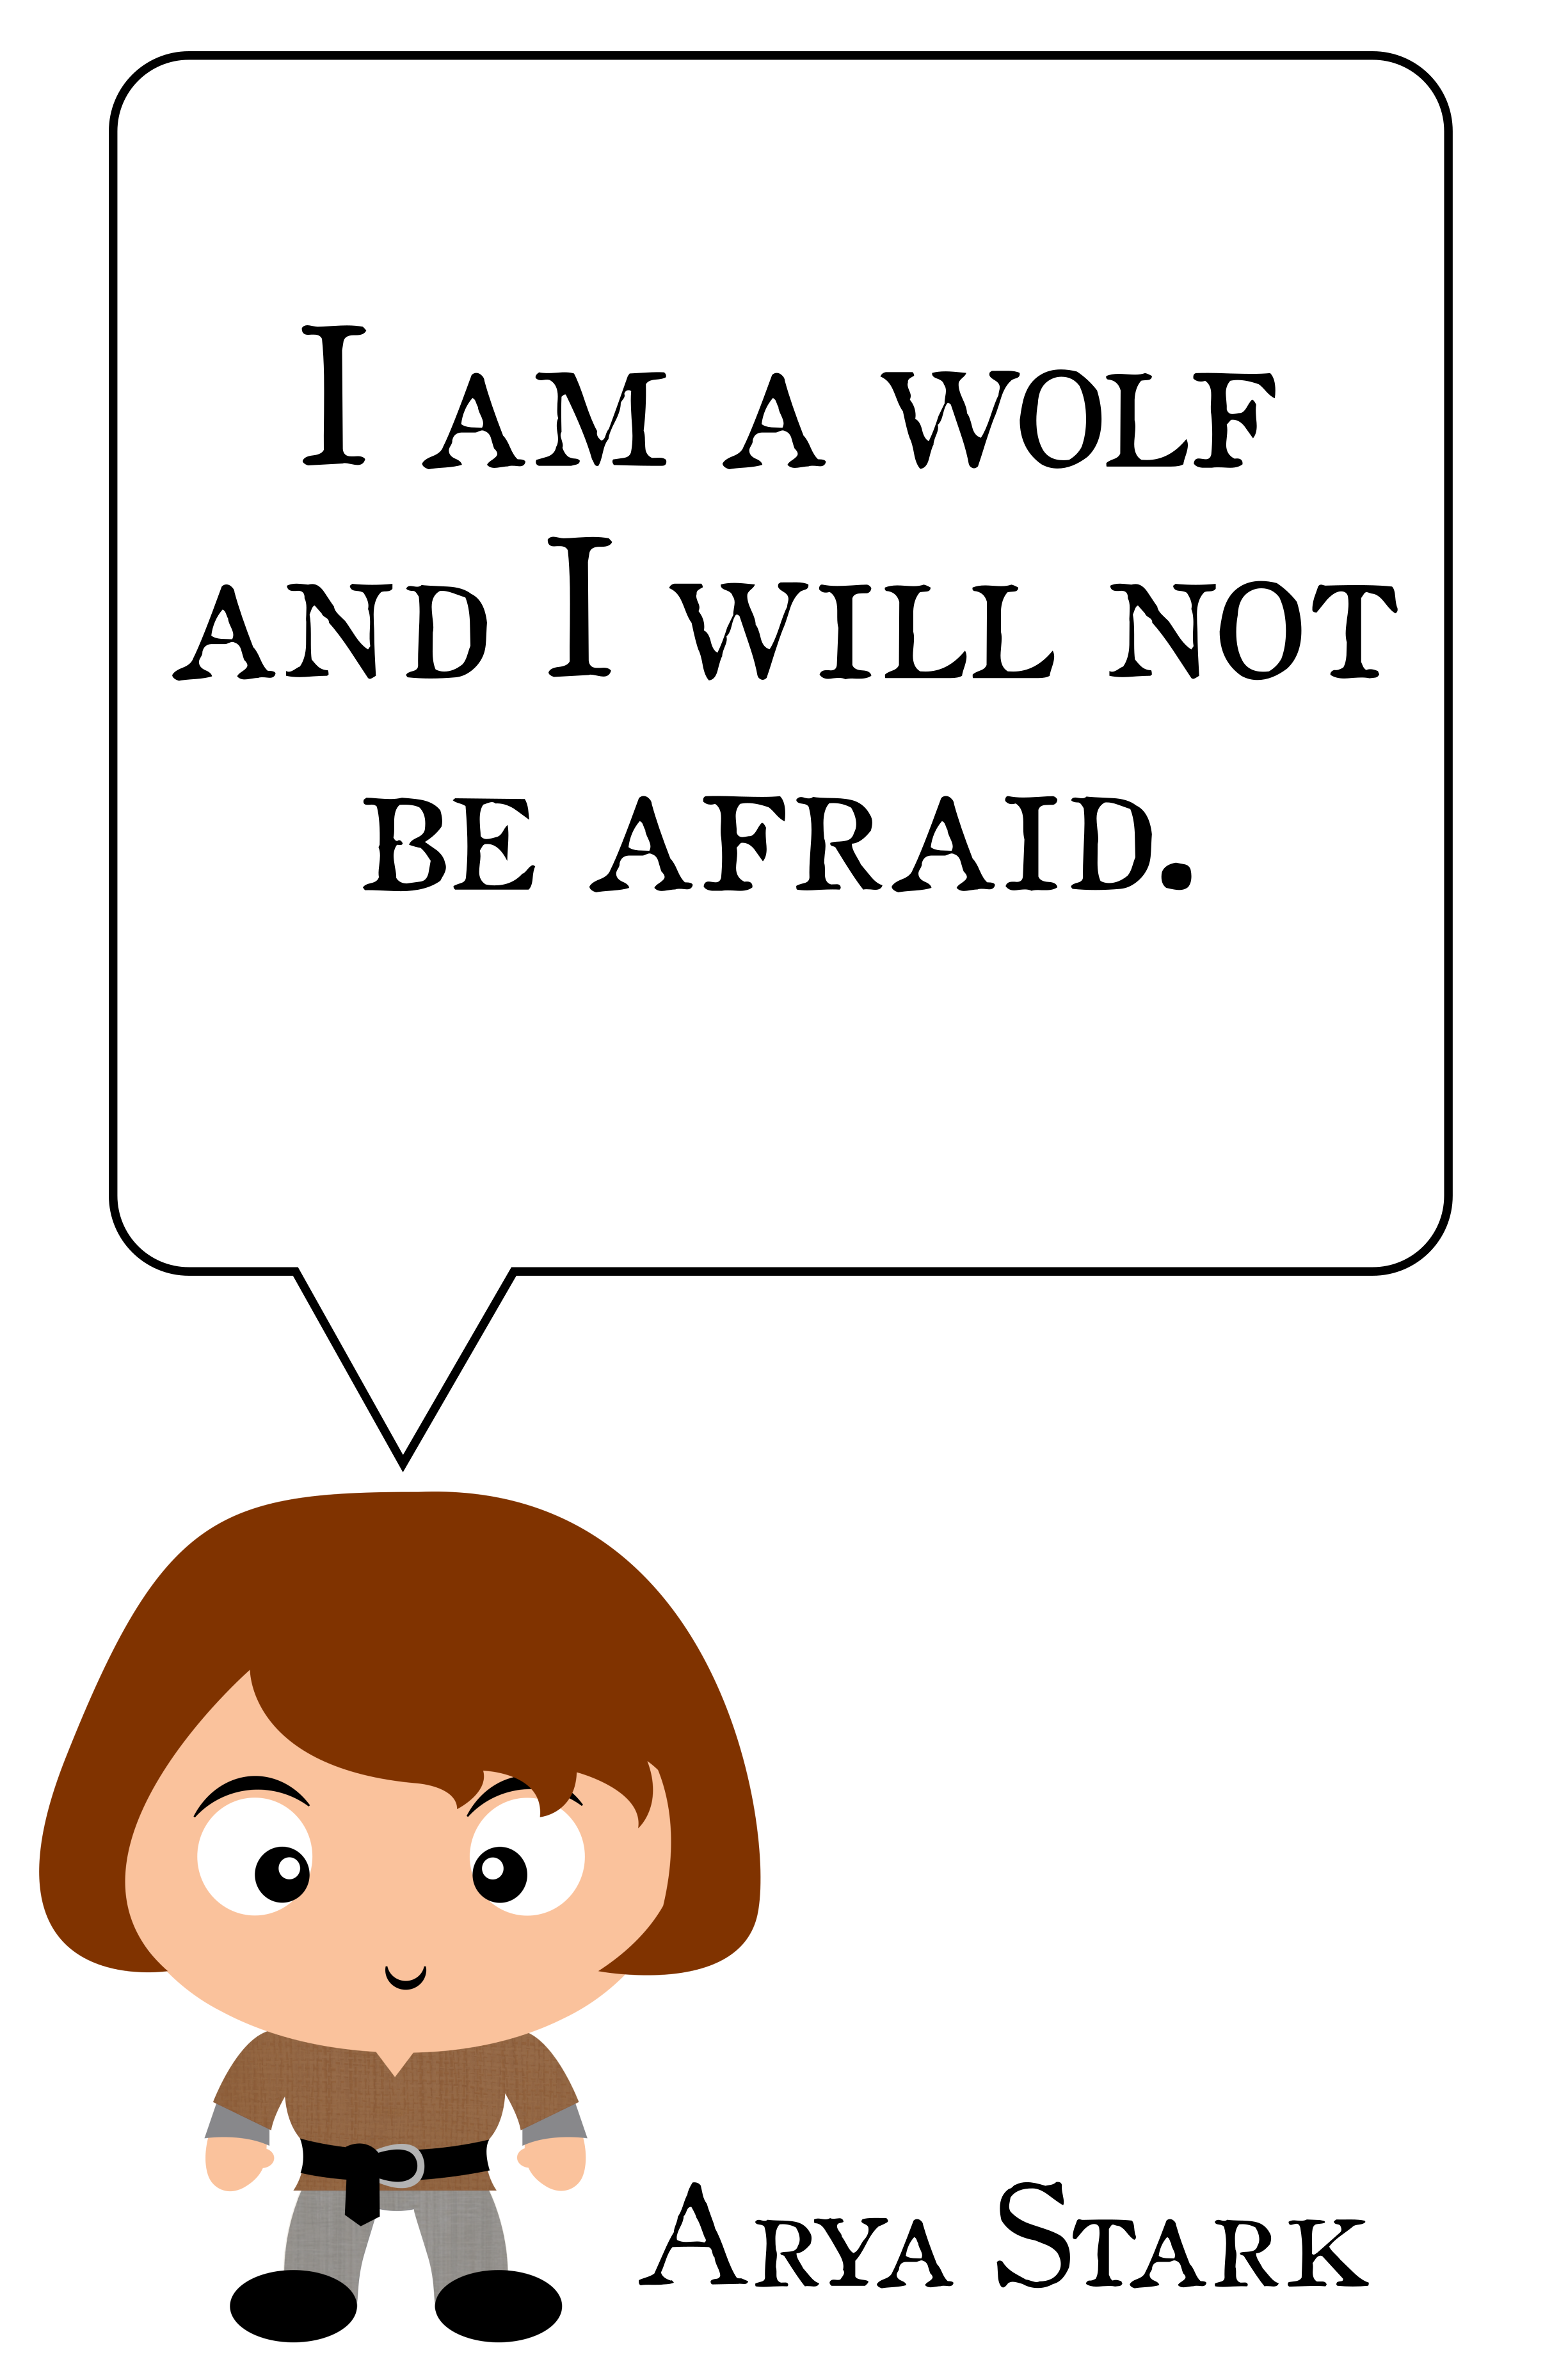 Sansa Stark clipart #18, Download drawings